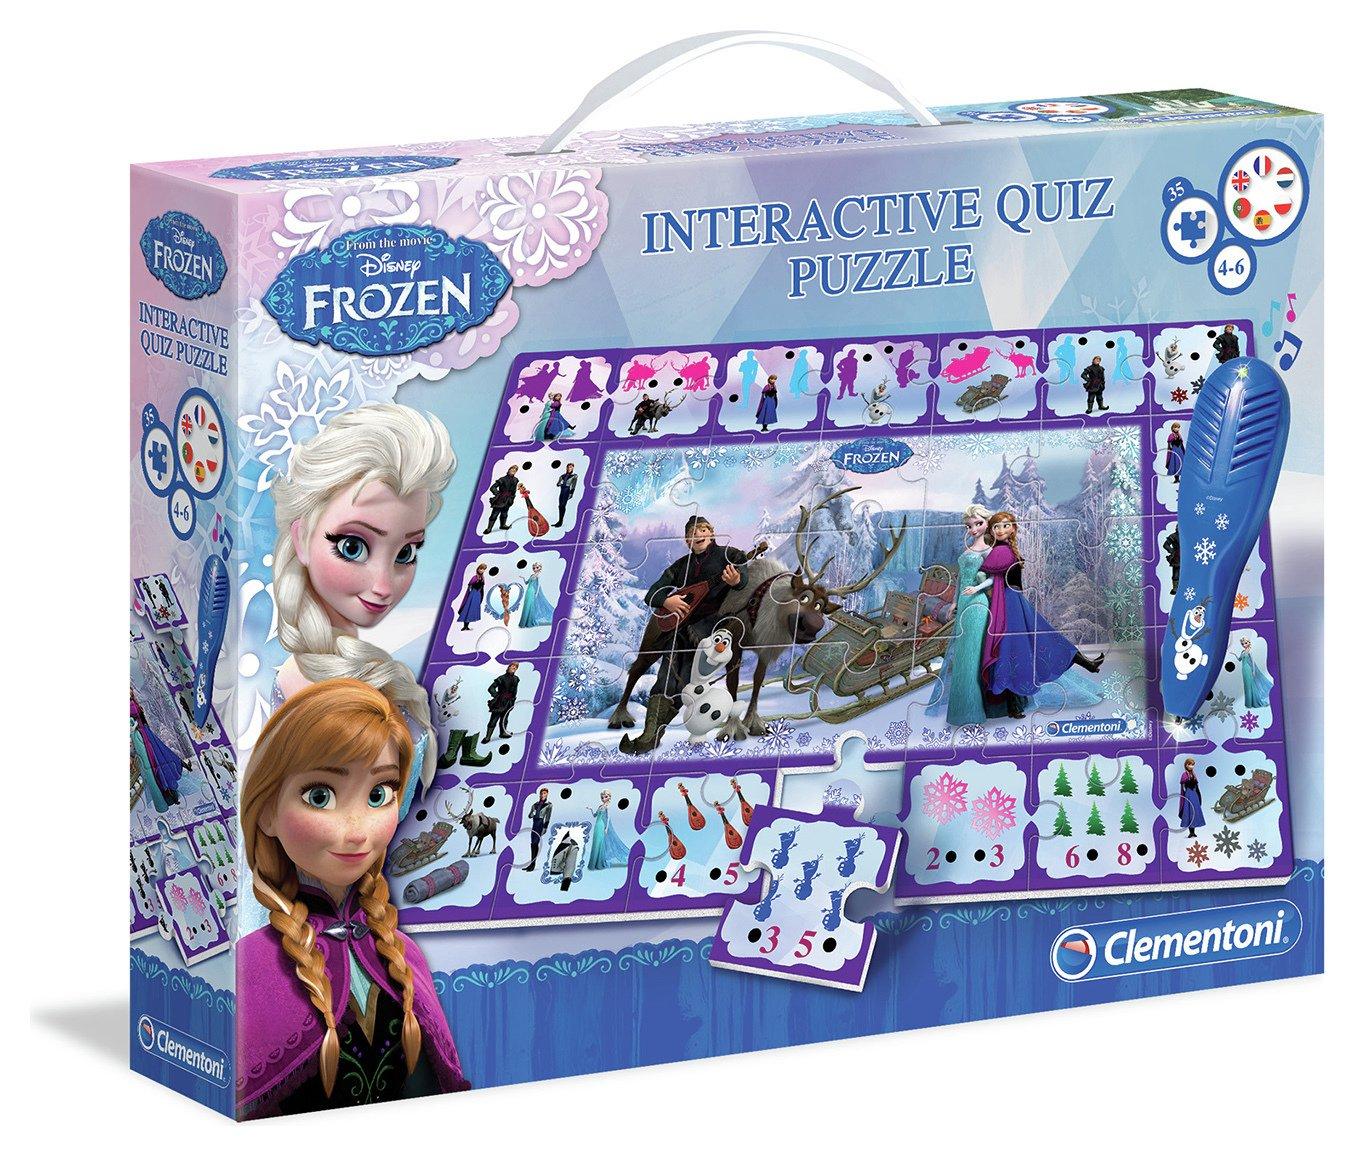 Image of Clementoni Disney Frozen Interactive Quiz Puzzle.